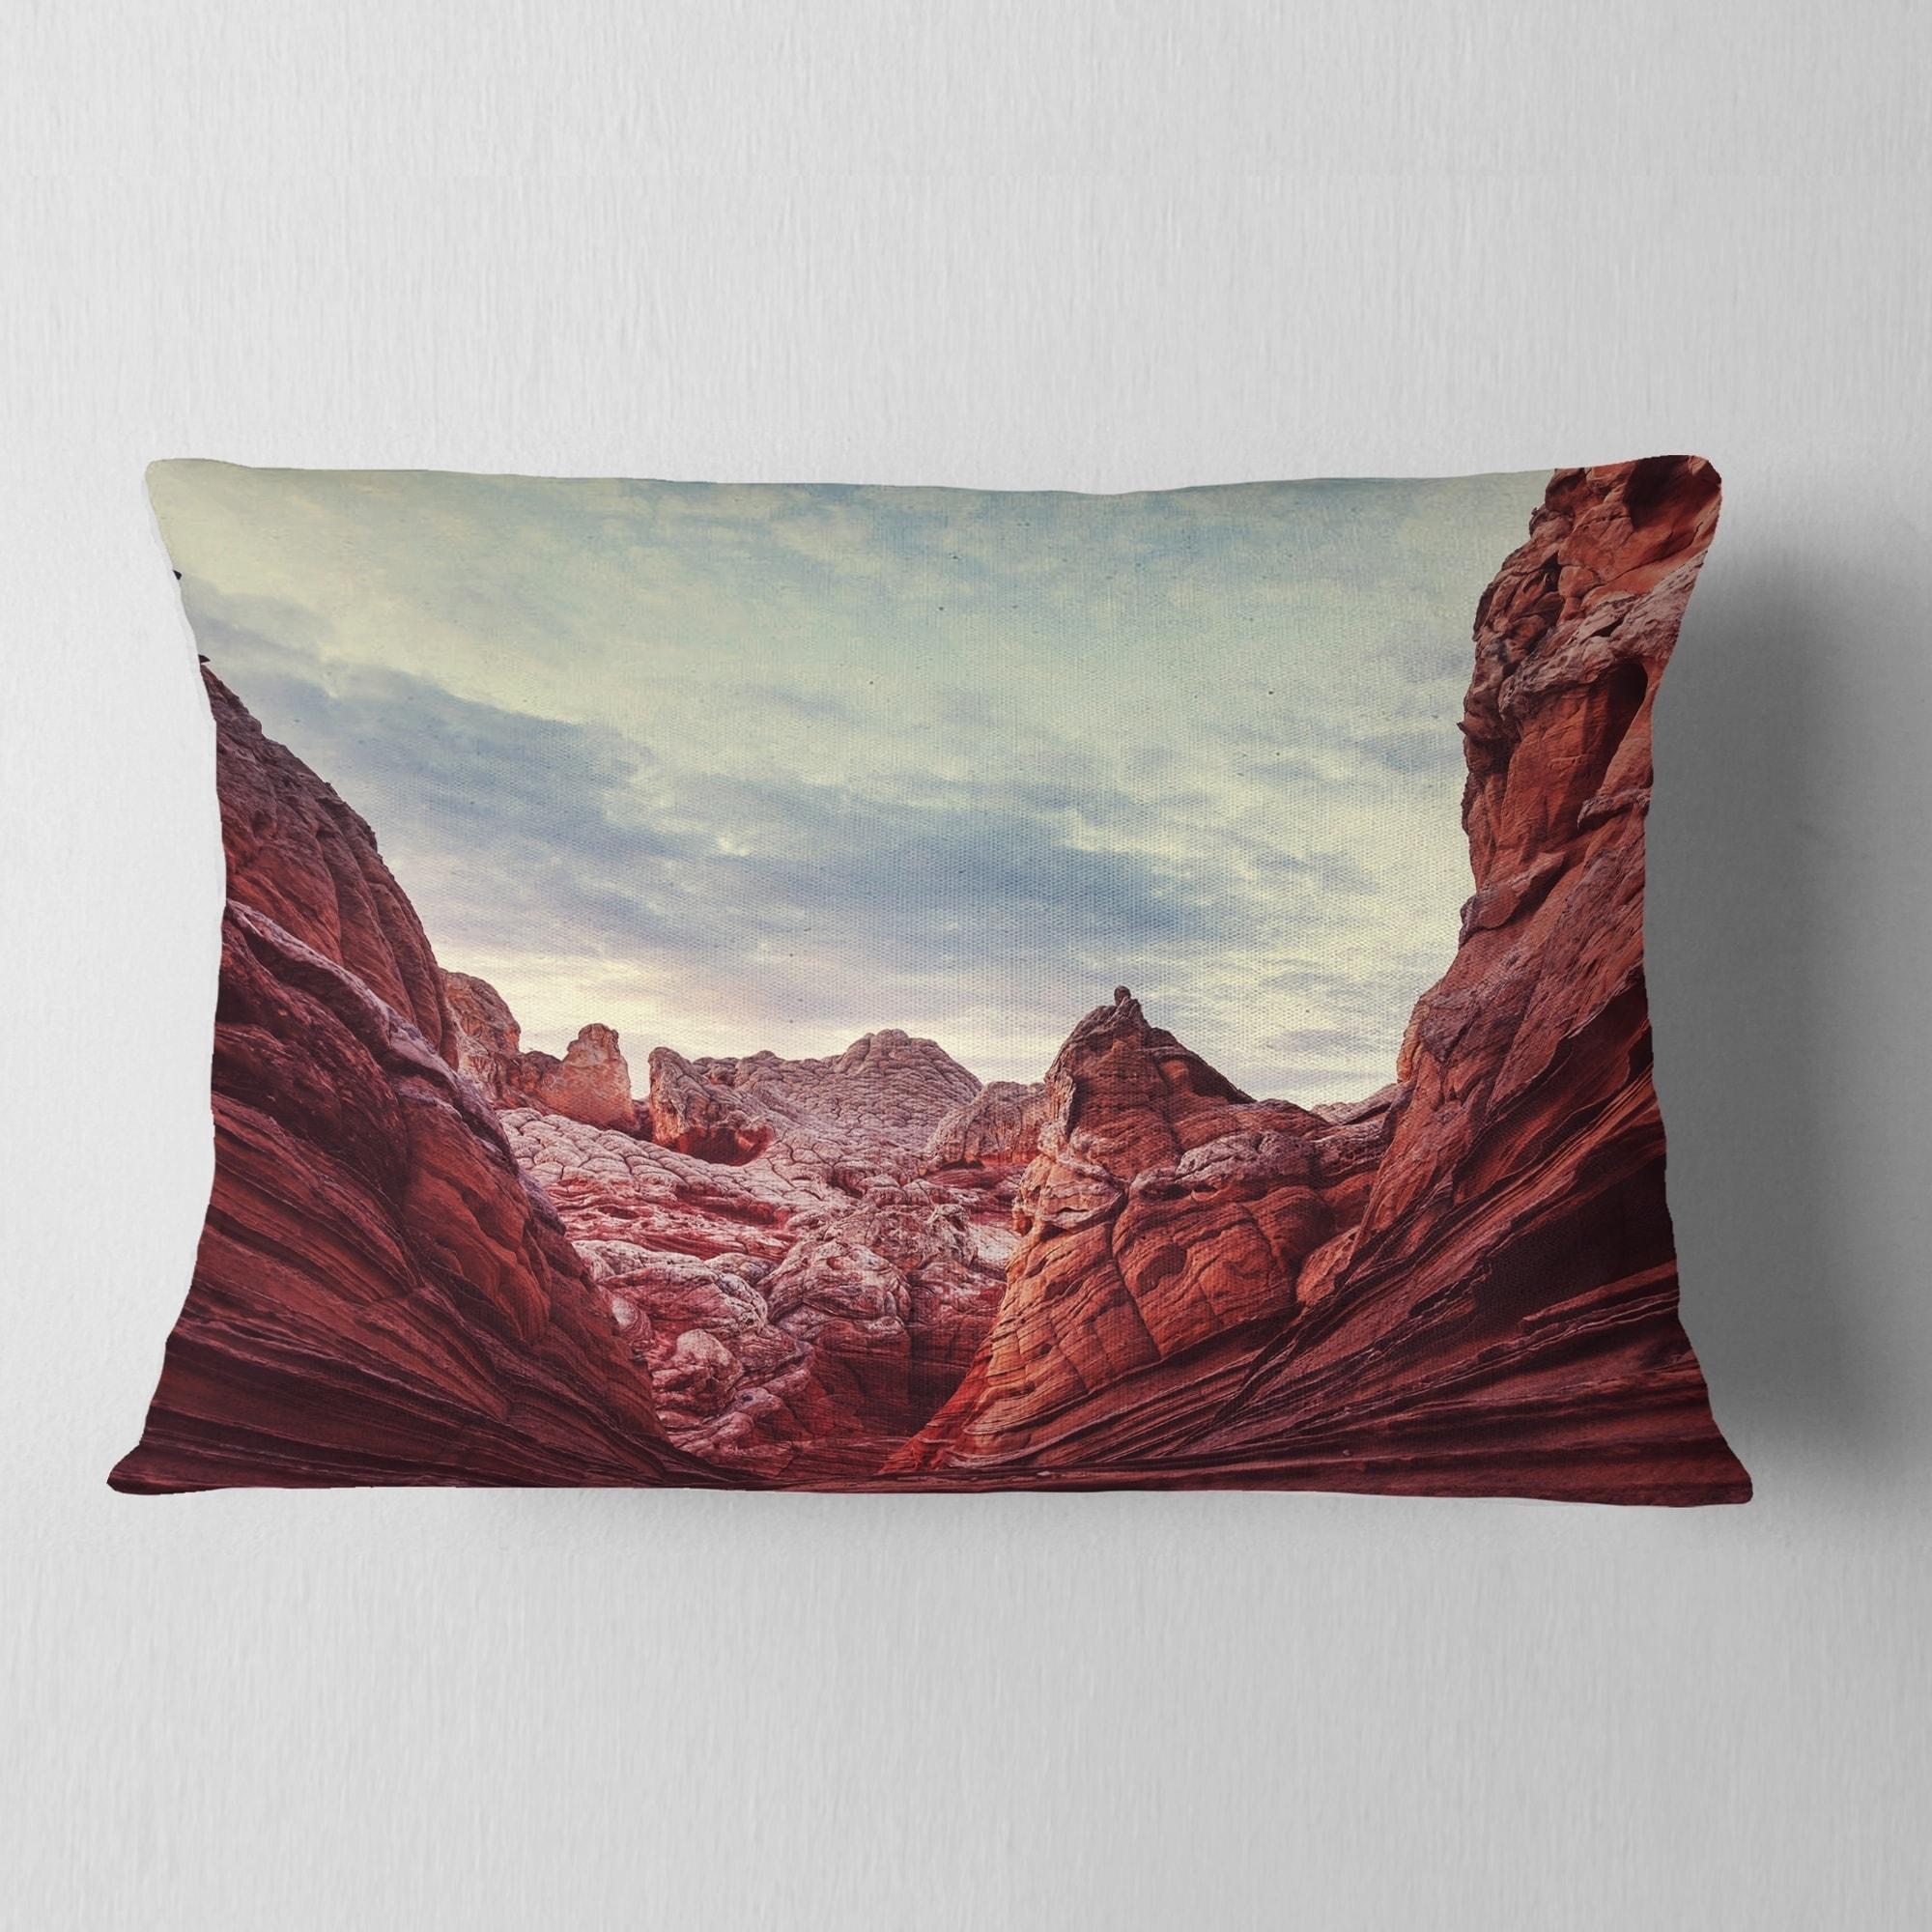 Designart Vermillion Cliffs National Monument Park Landscape Wall Throw Pillow On Sale Overstock 20949663